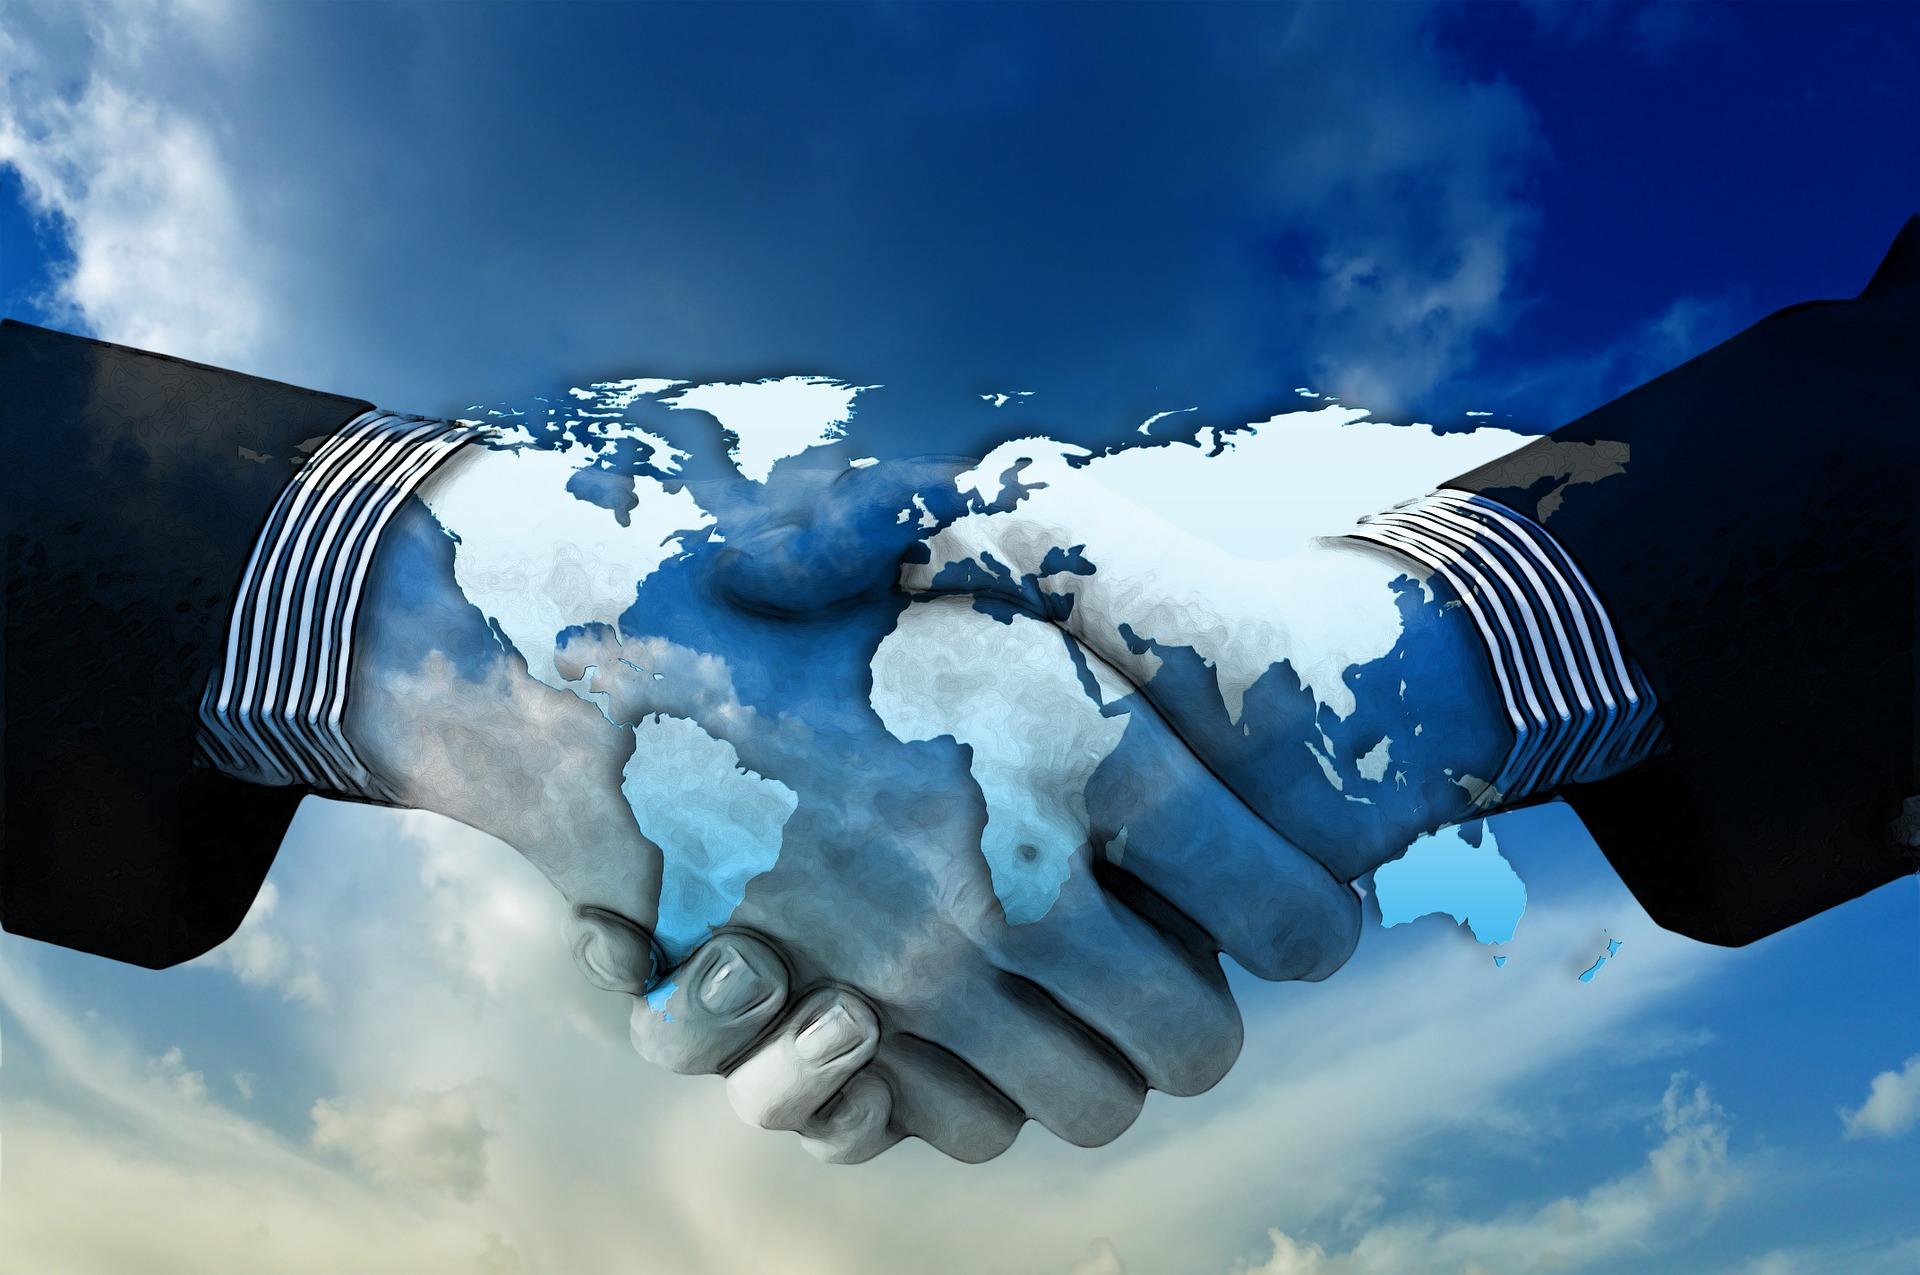 convenzioni internazionali trattati accordi spiegati bene